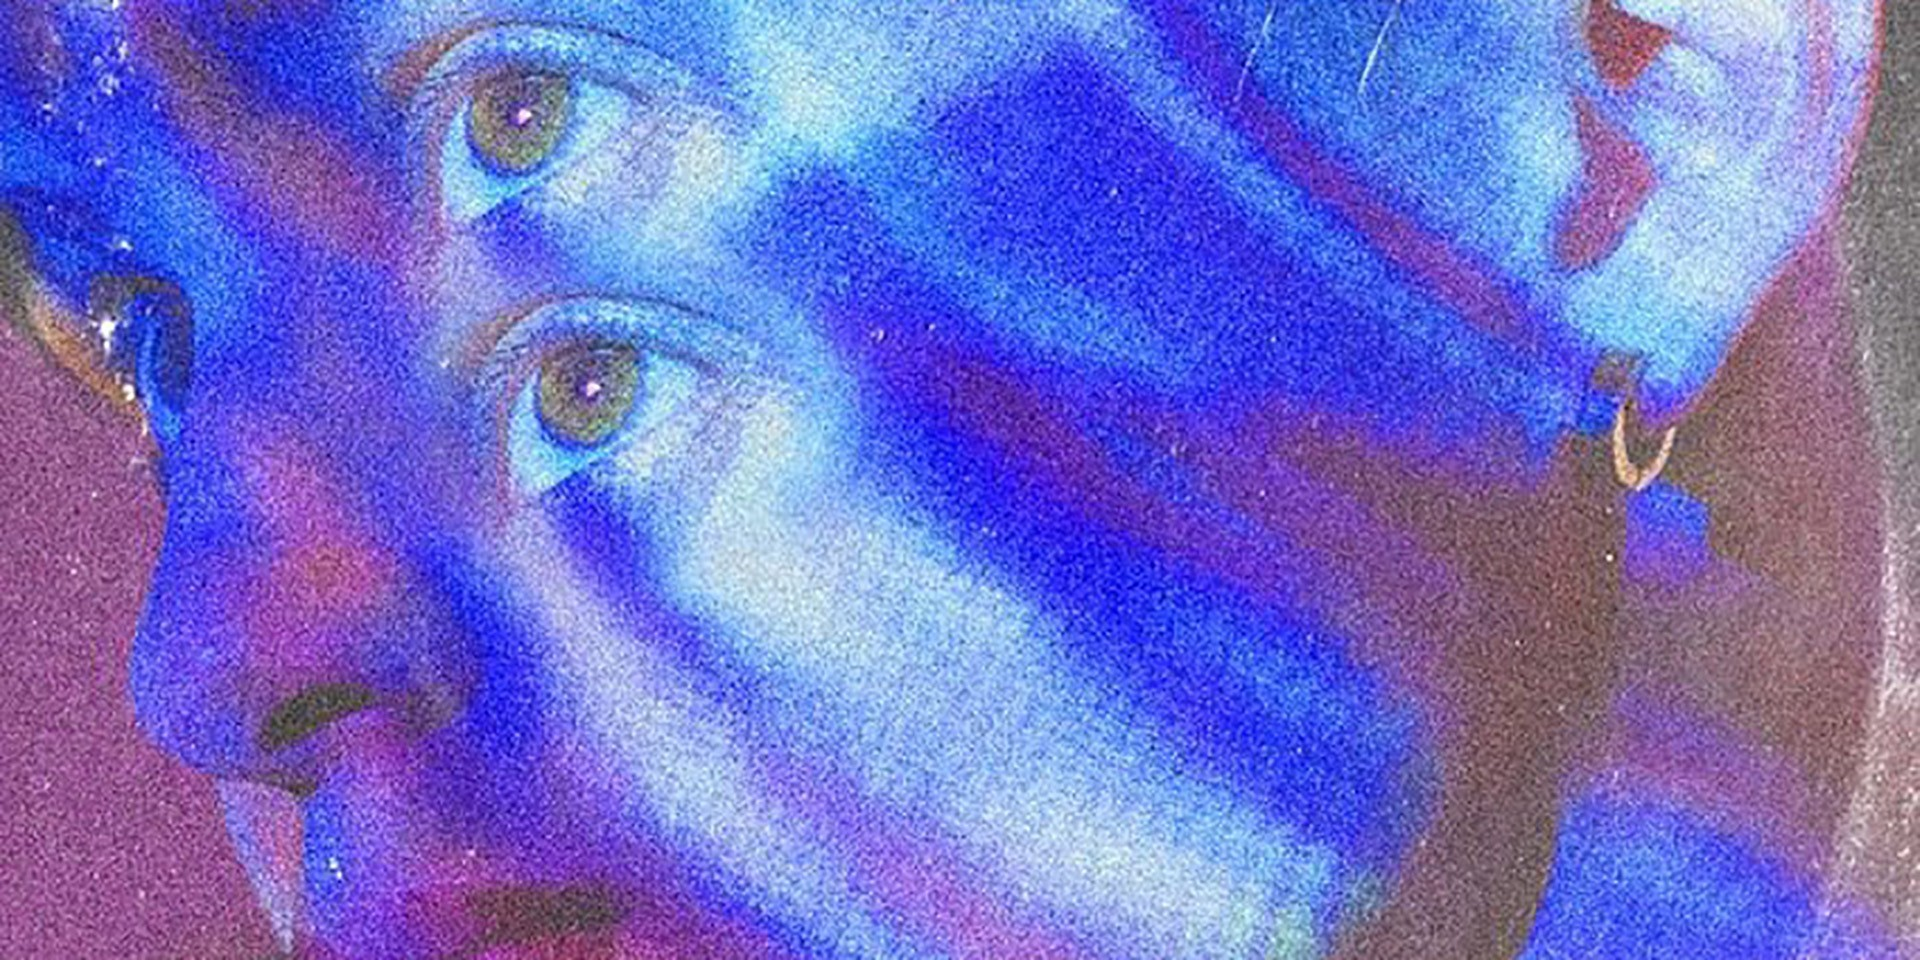 James Reid returns with new single '16B' – listen